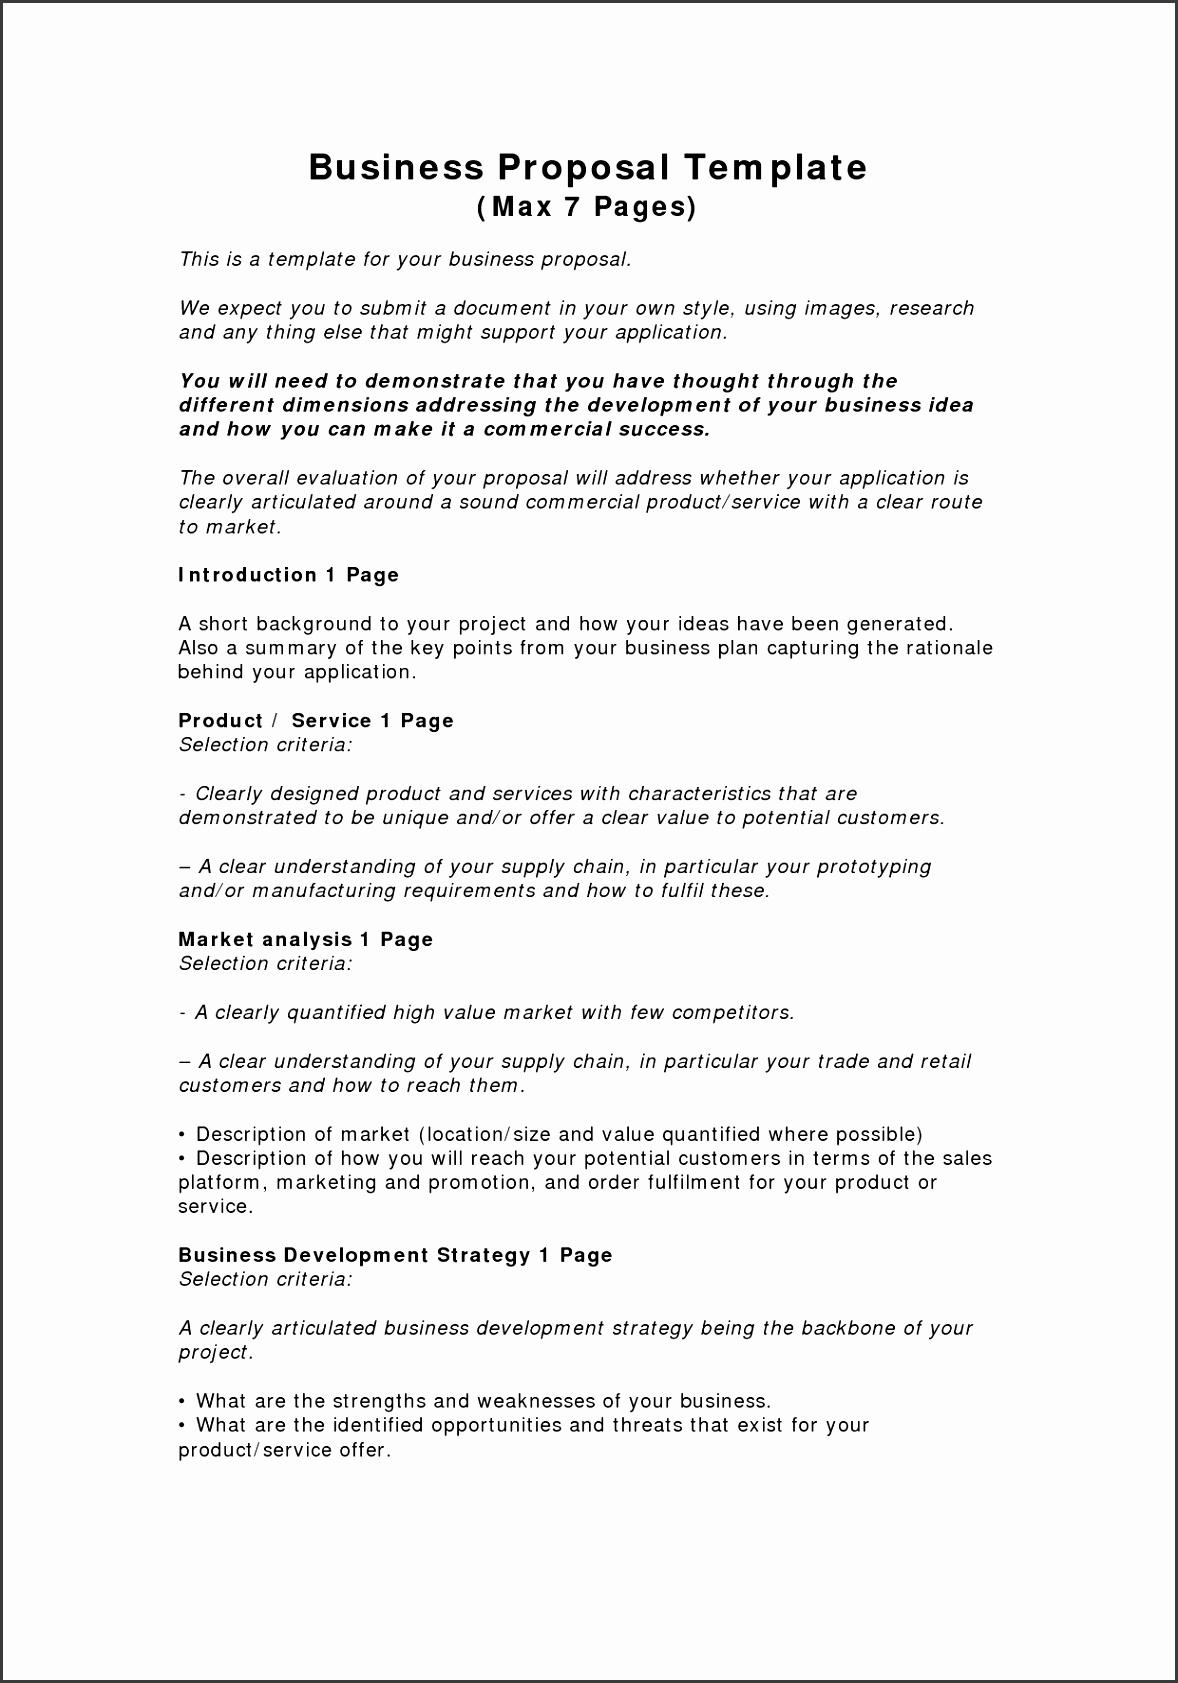 Business Plan Proposal Template Inspirational Business Proposal Templates Examples Business